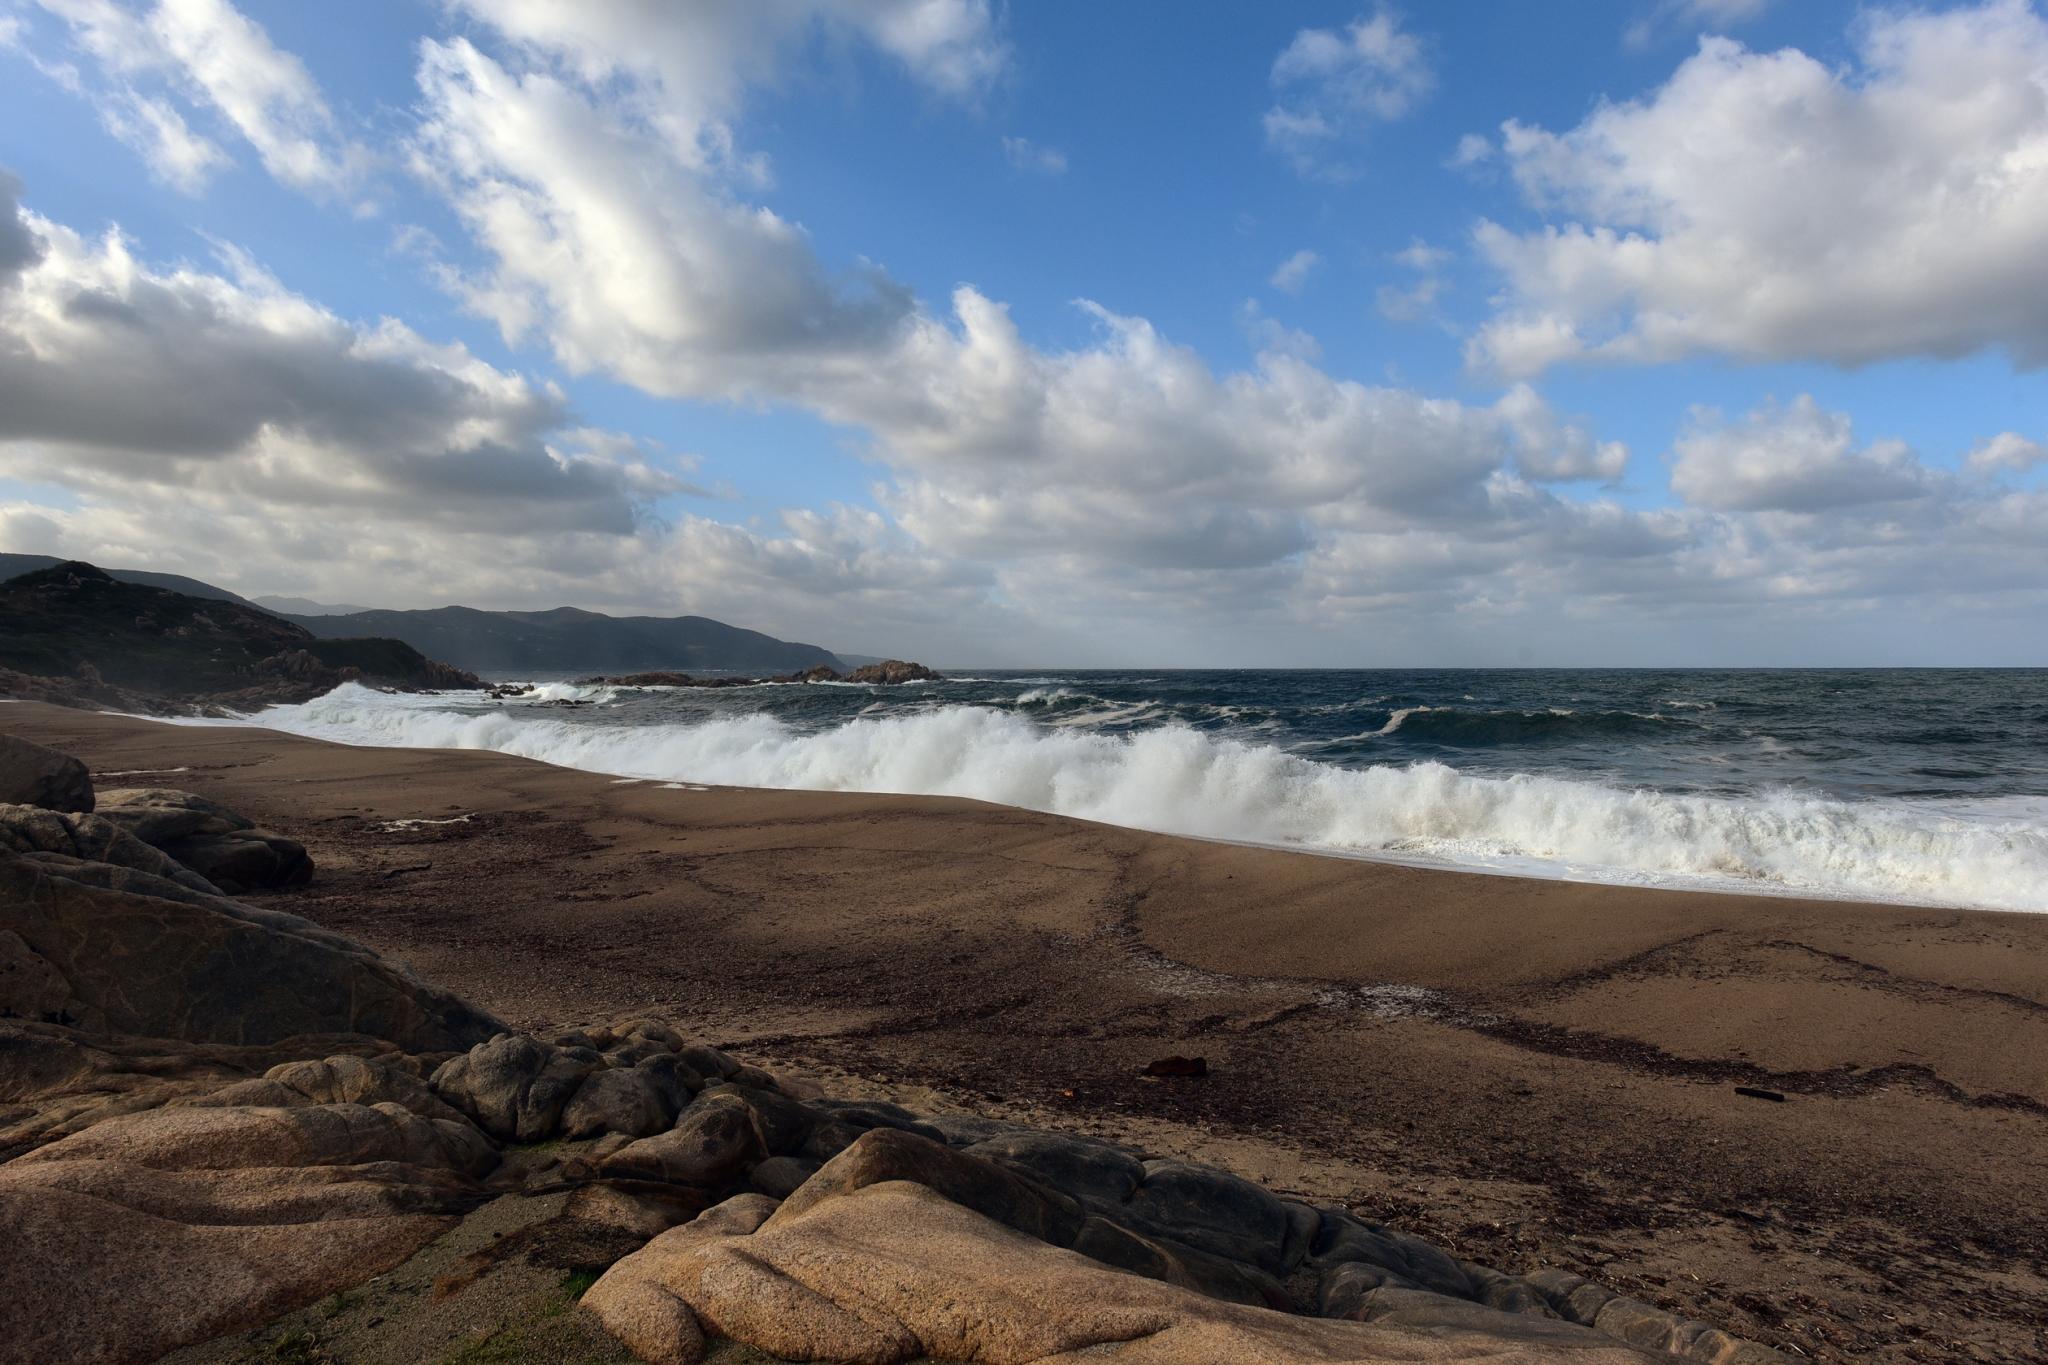 BAUER Jean-Maurice - Expo 2017 - Papier 4 - Mer agitée Pointe d'Omigna (Corse)